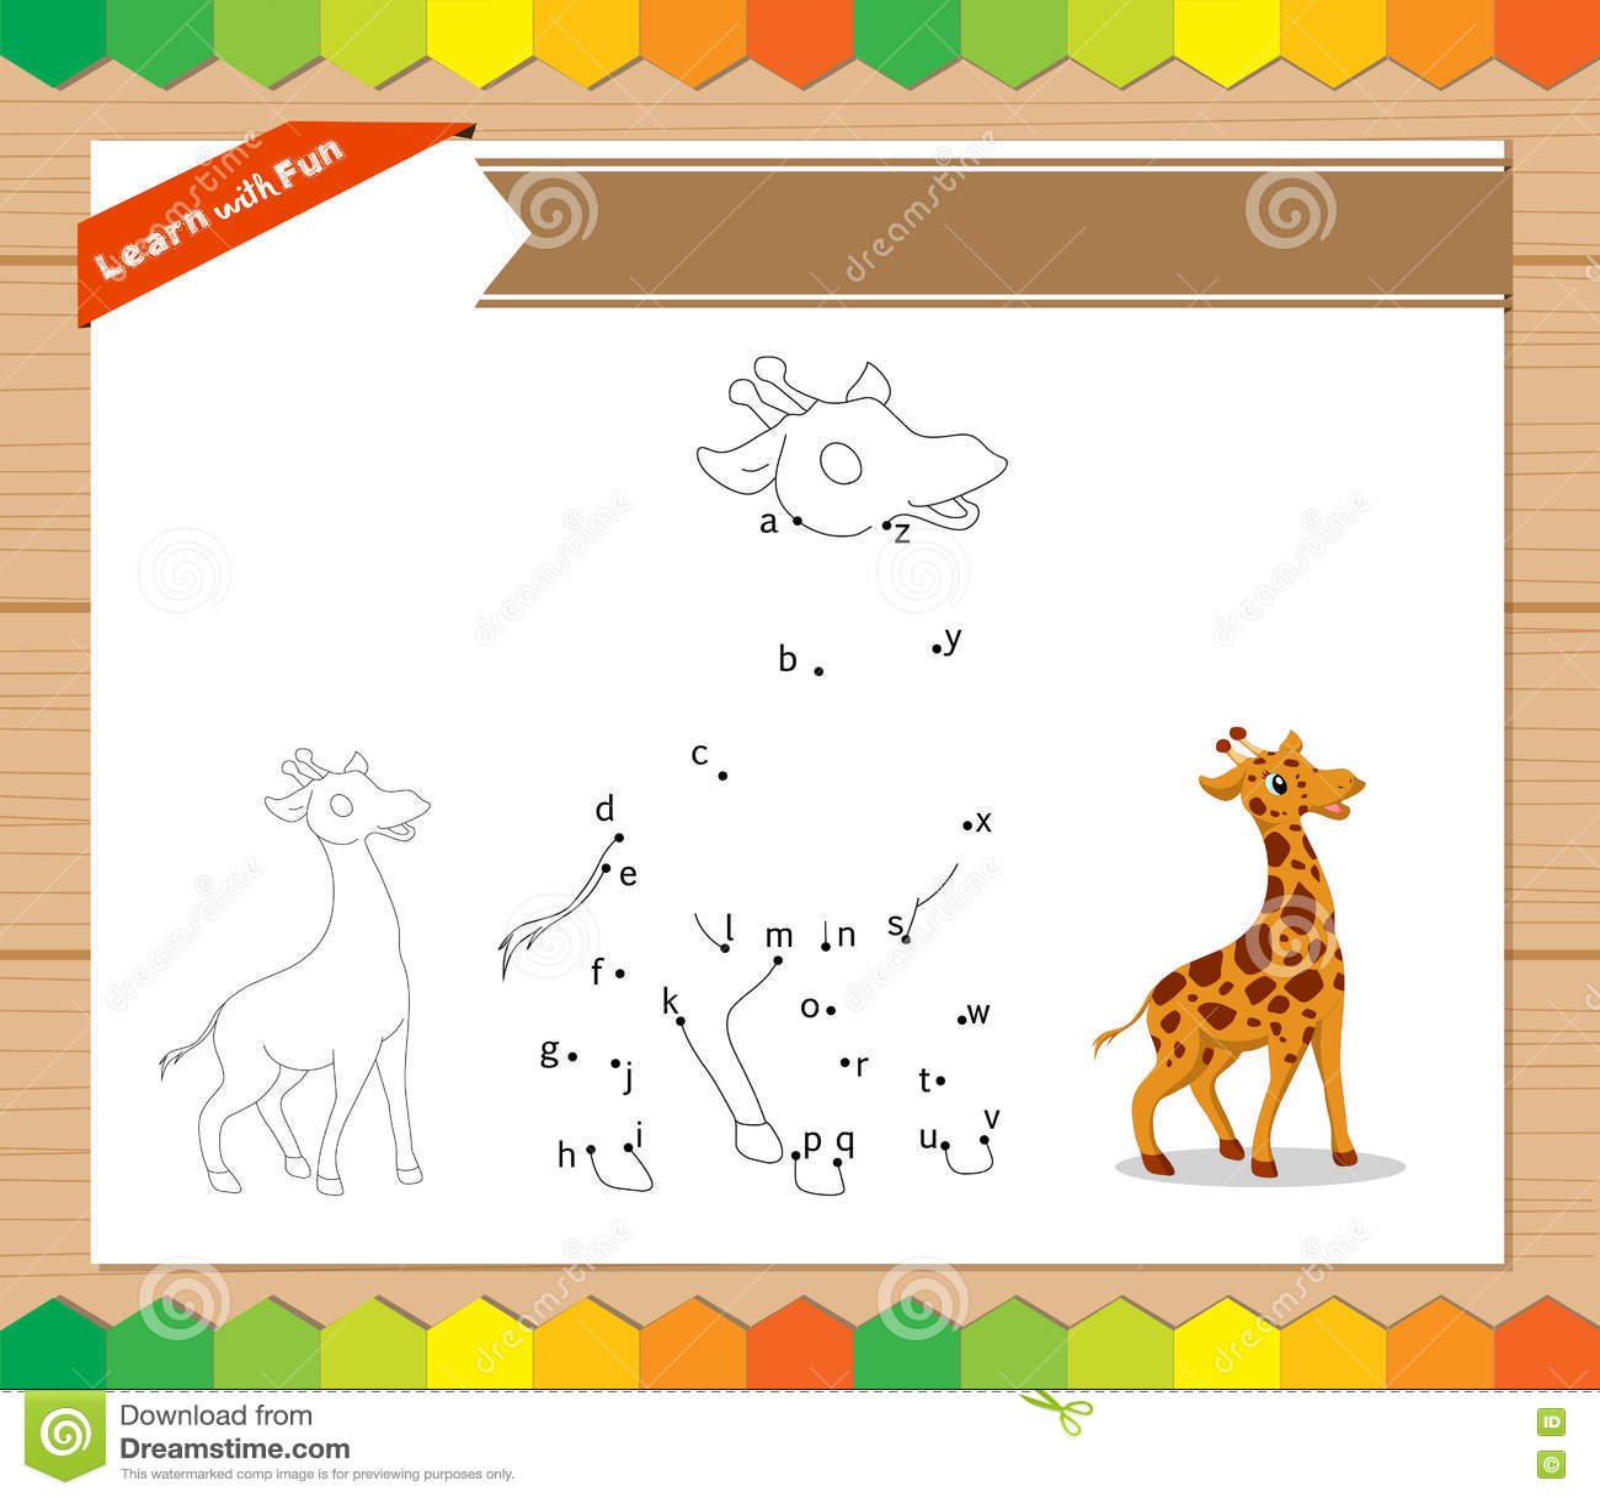 Cartoon Giraffe Dot To Dot Educational Game For Kids